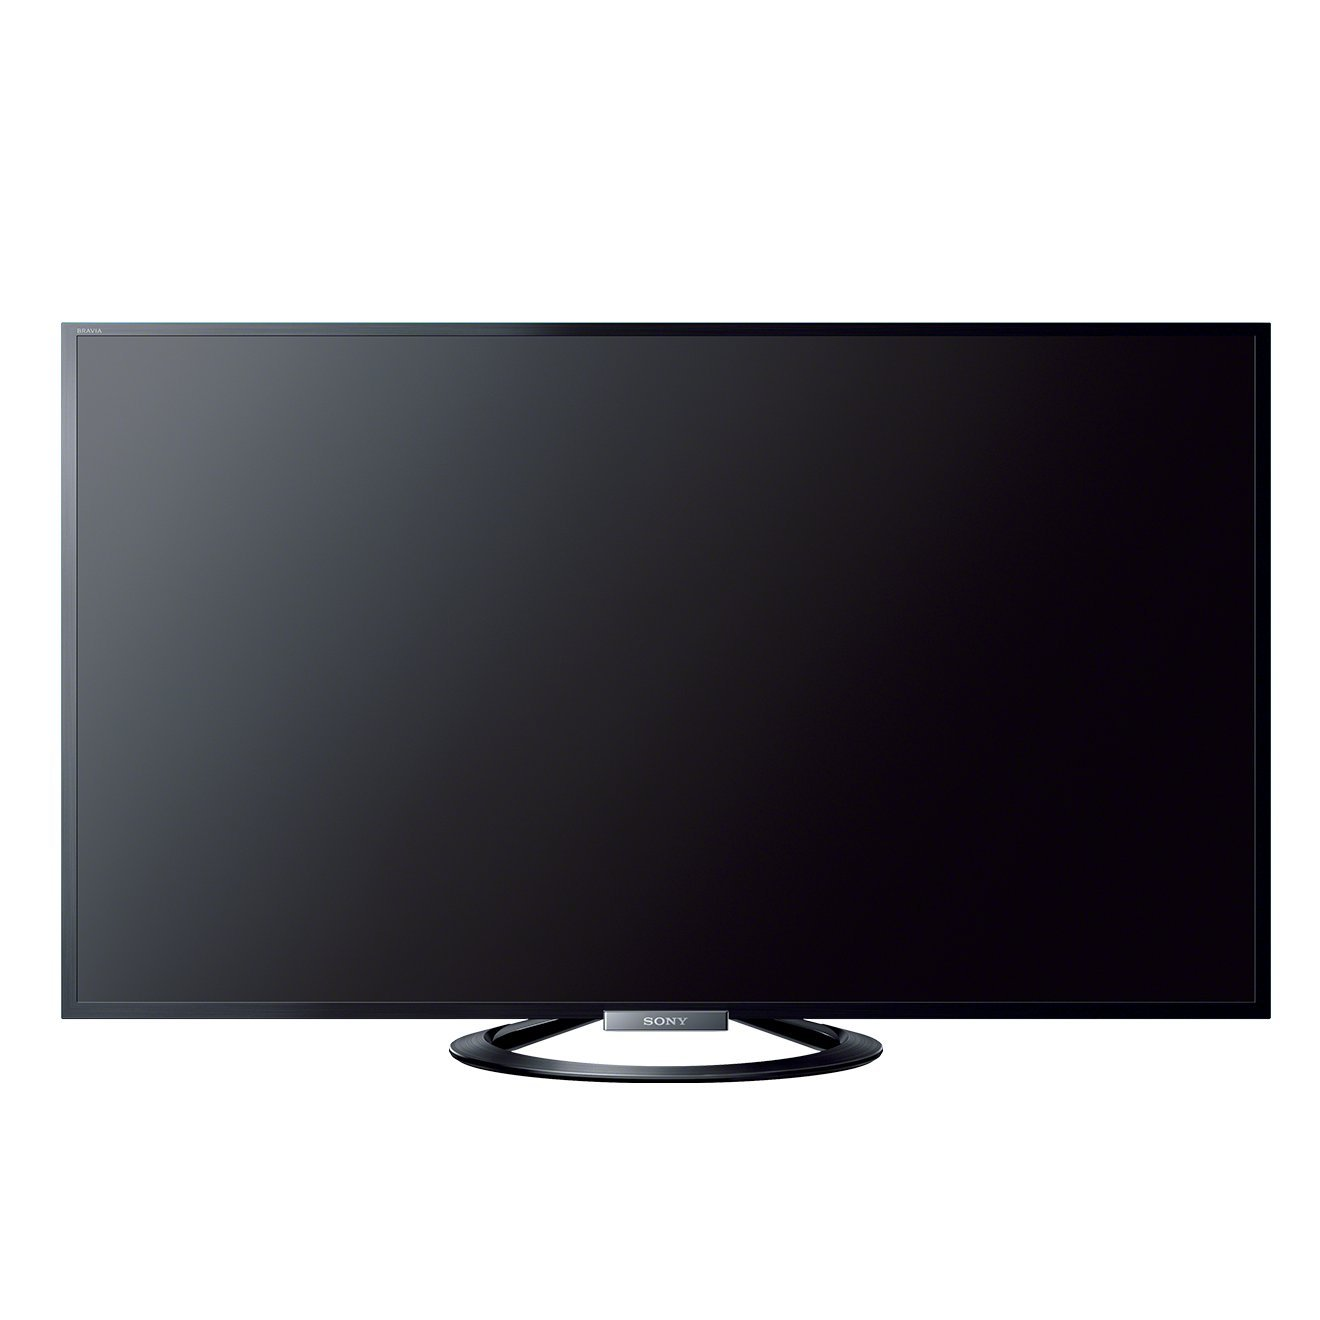 Sony KDL-47W805A - Televisor (Full HD, A+, 16:9, 14:9, 16:9, Auto ...